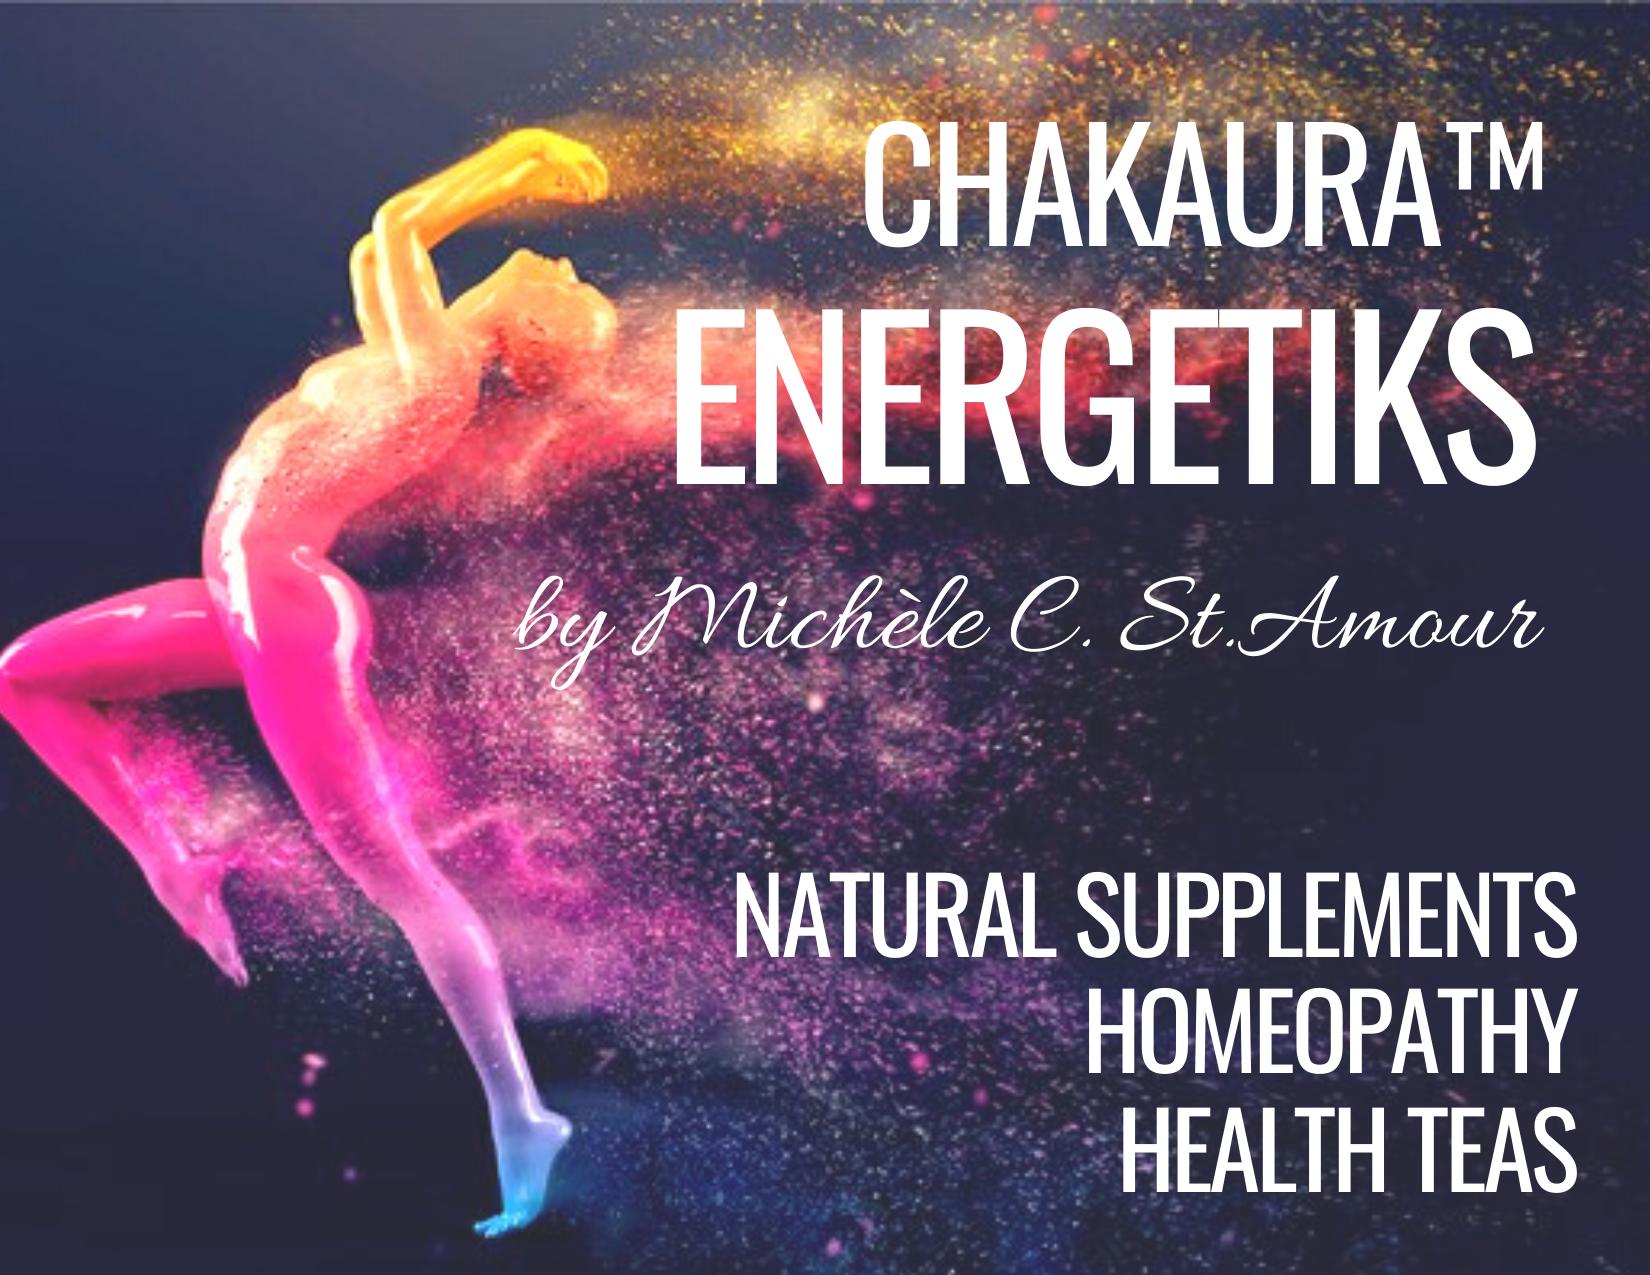 chakaura products